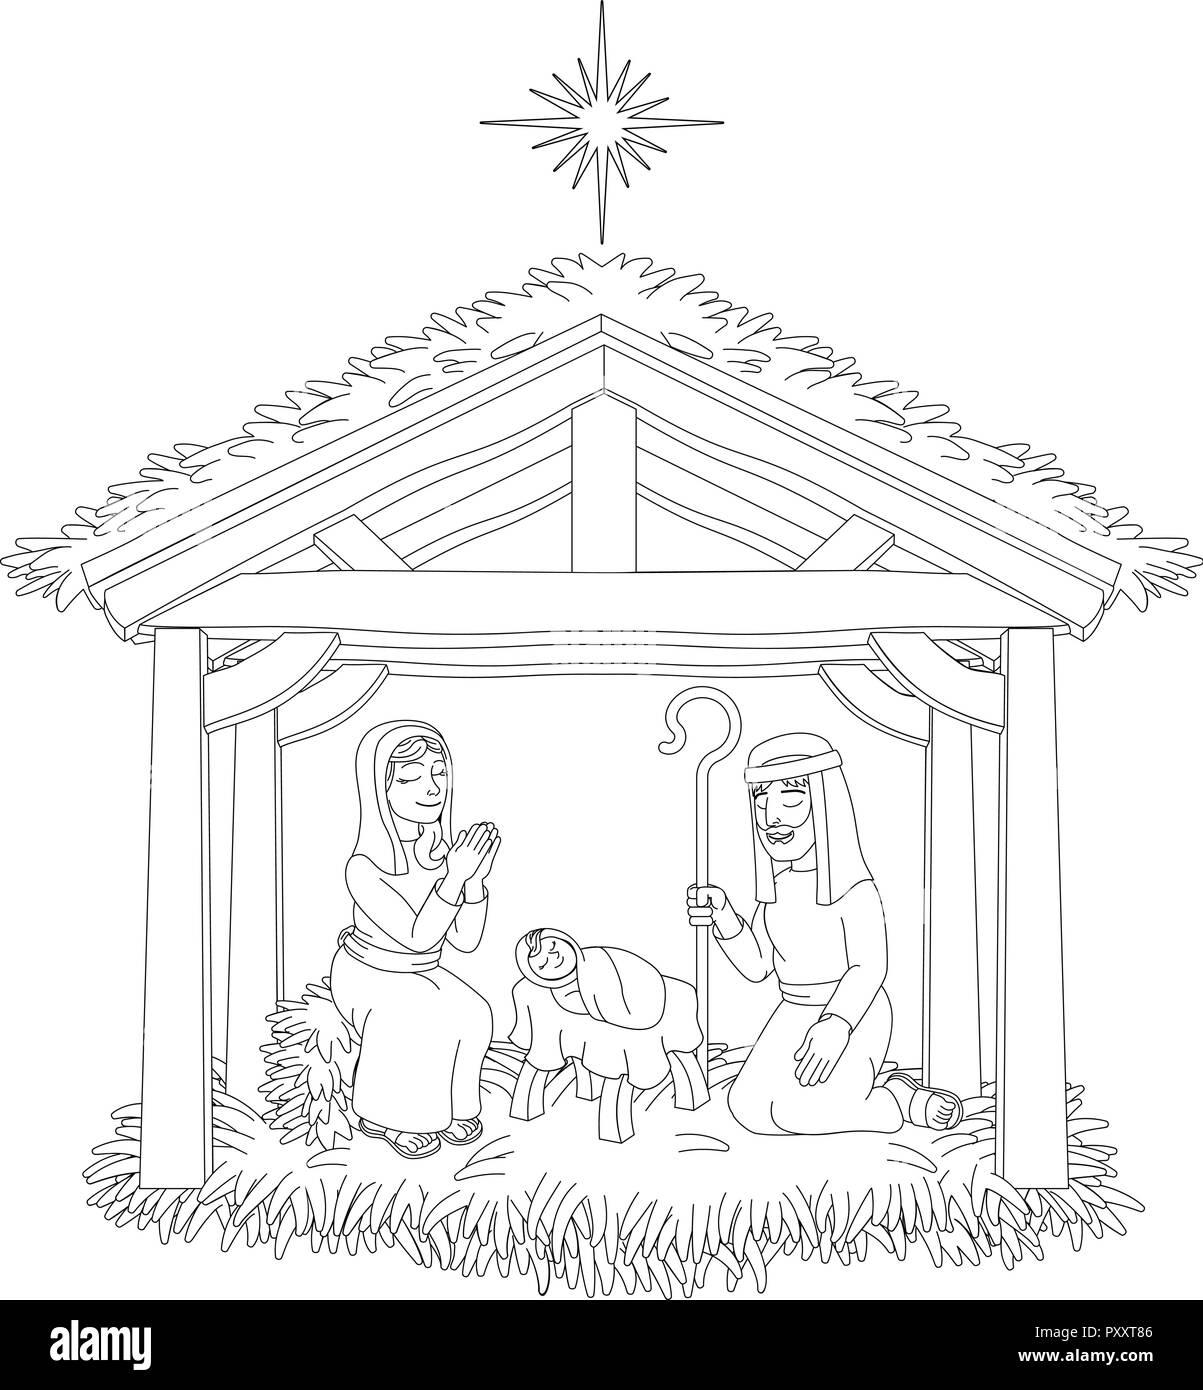 Christmas Nativity Scene Cartoon Coloring Stock Vector Art